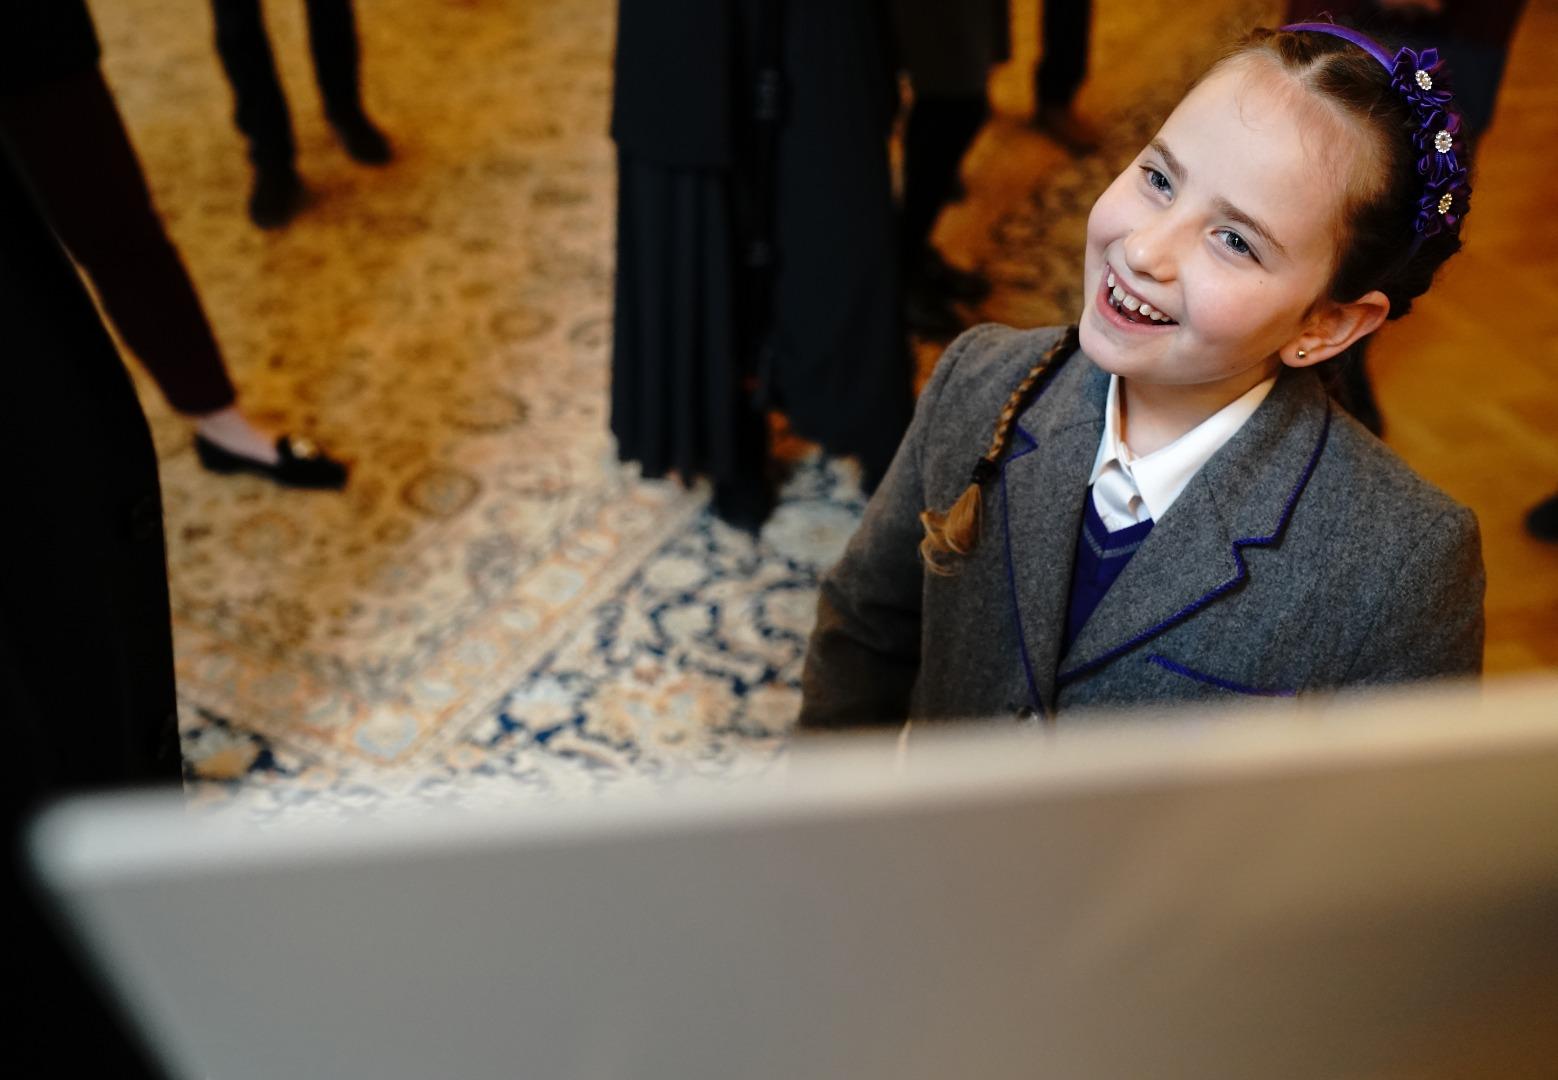 Manchester High School for Girls pupil wins